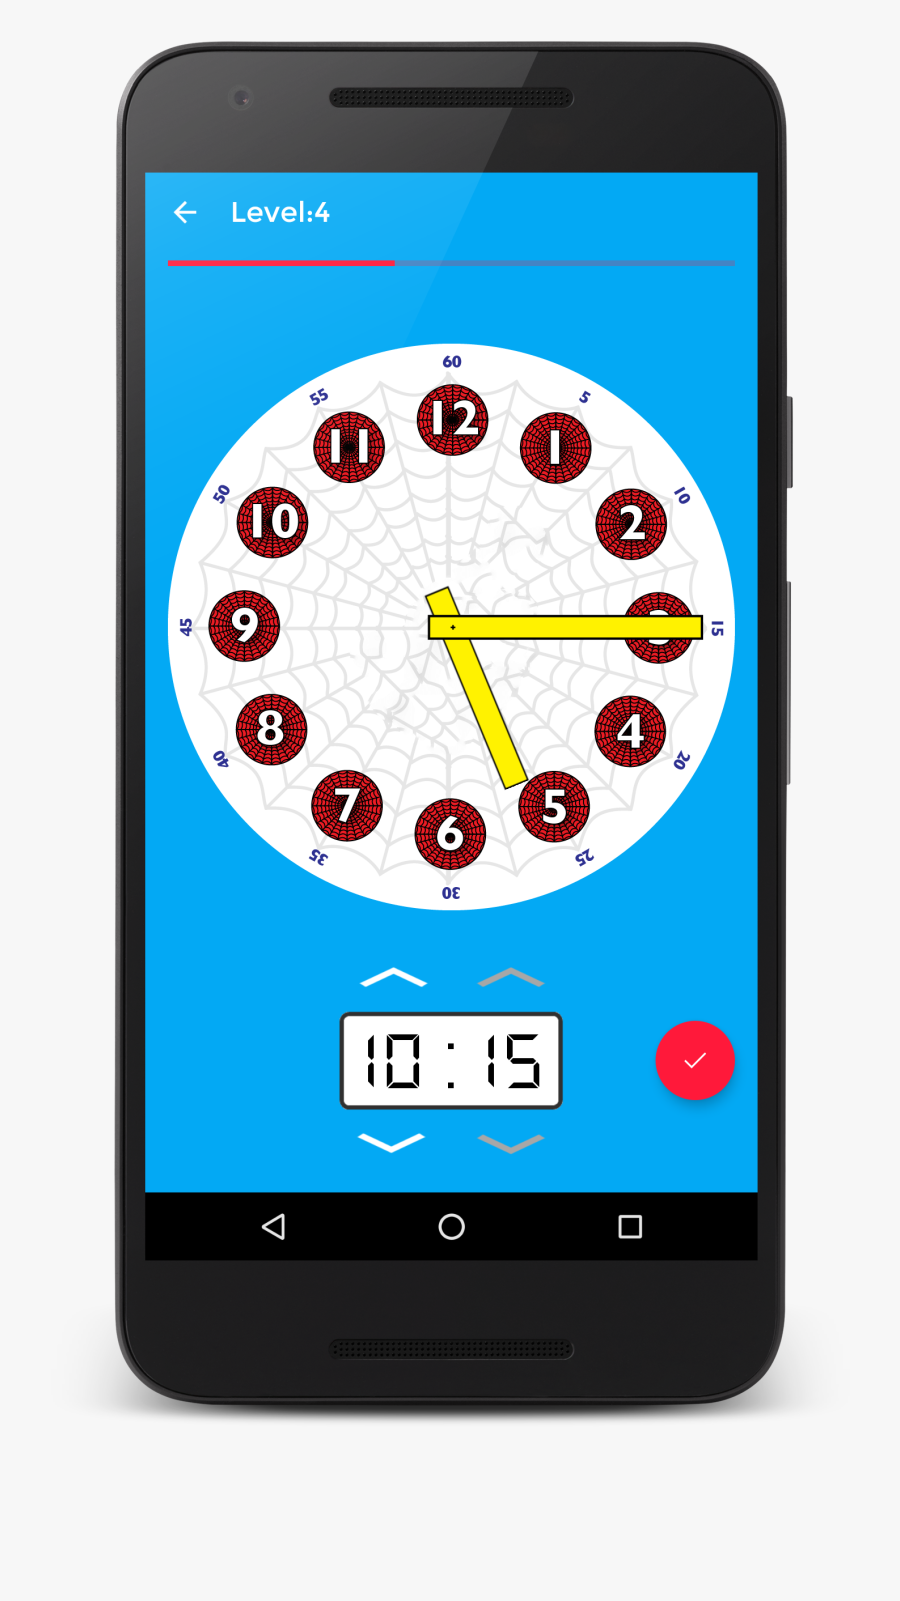 Smartphone Clipart , Png Download - قلم رصاص ايام زمان, Transparent Clipart